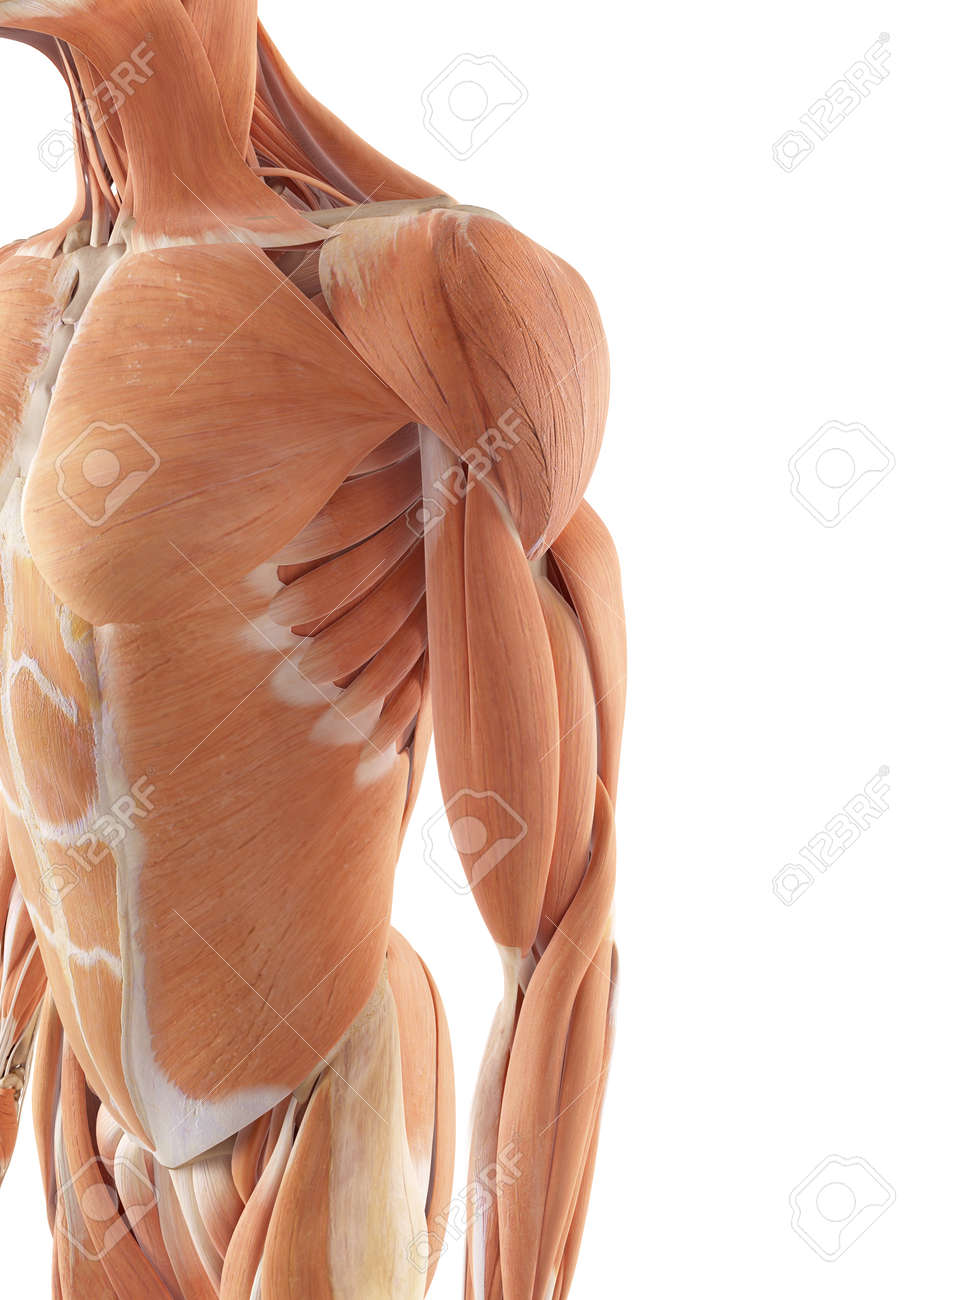 Excelente Hombro Músculo Modelo - Imágenes de Anatomía Humana ...